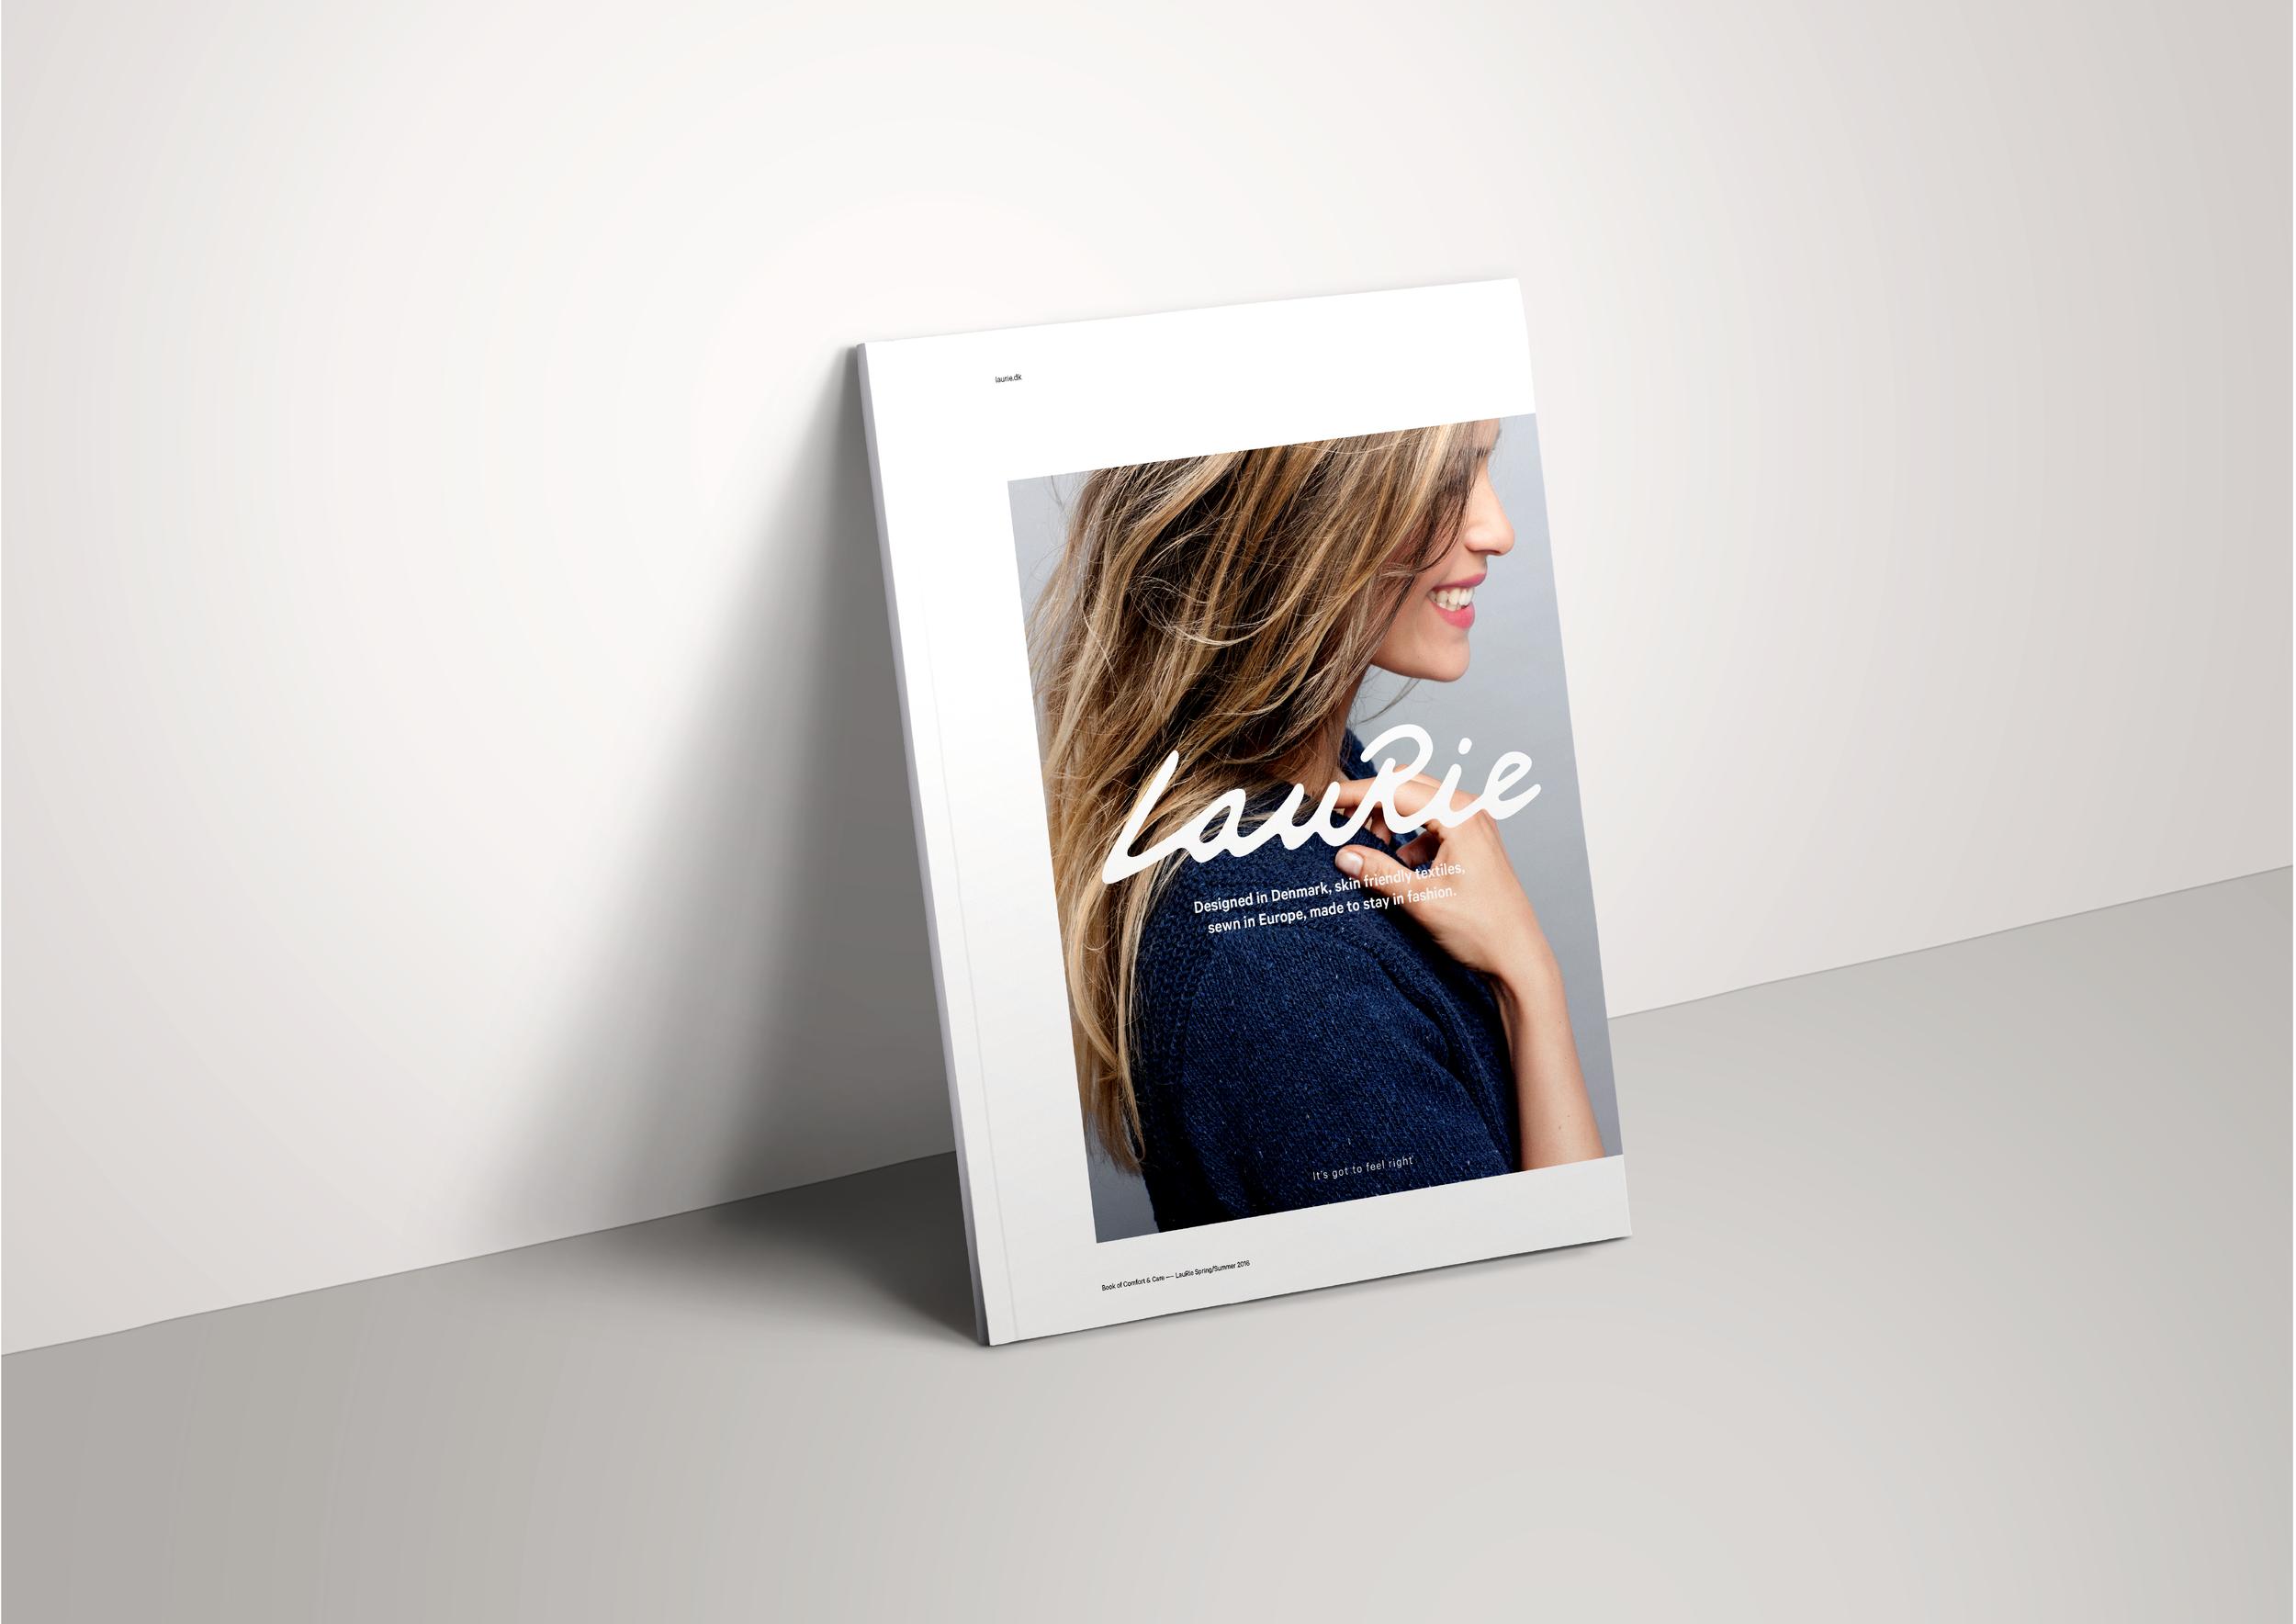 LauRie_Case_Goodvertising_x_FuhrStudio-01-04.png